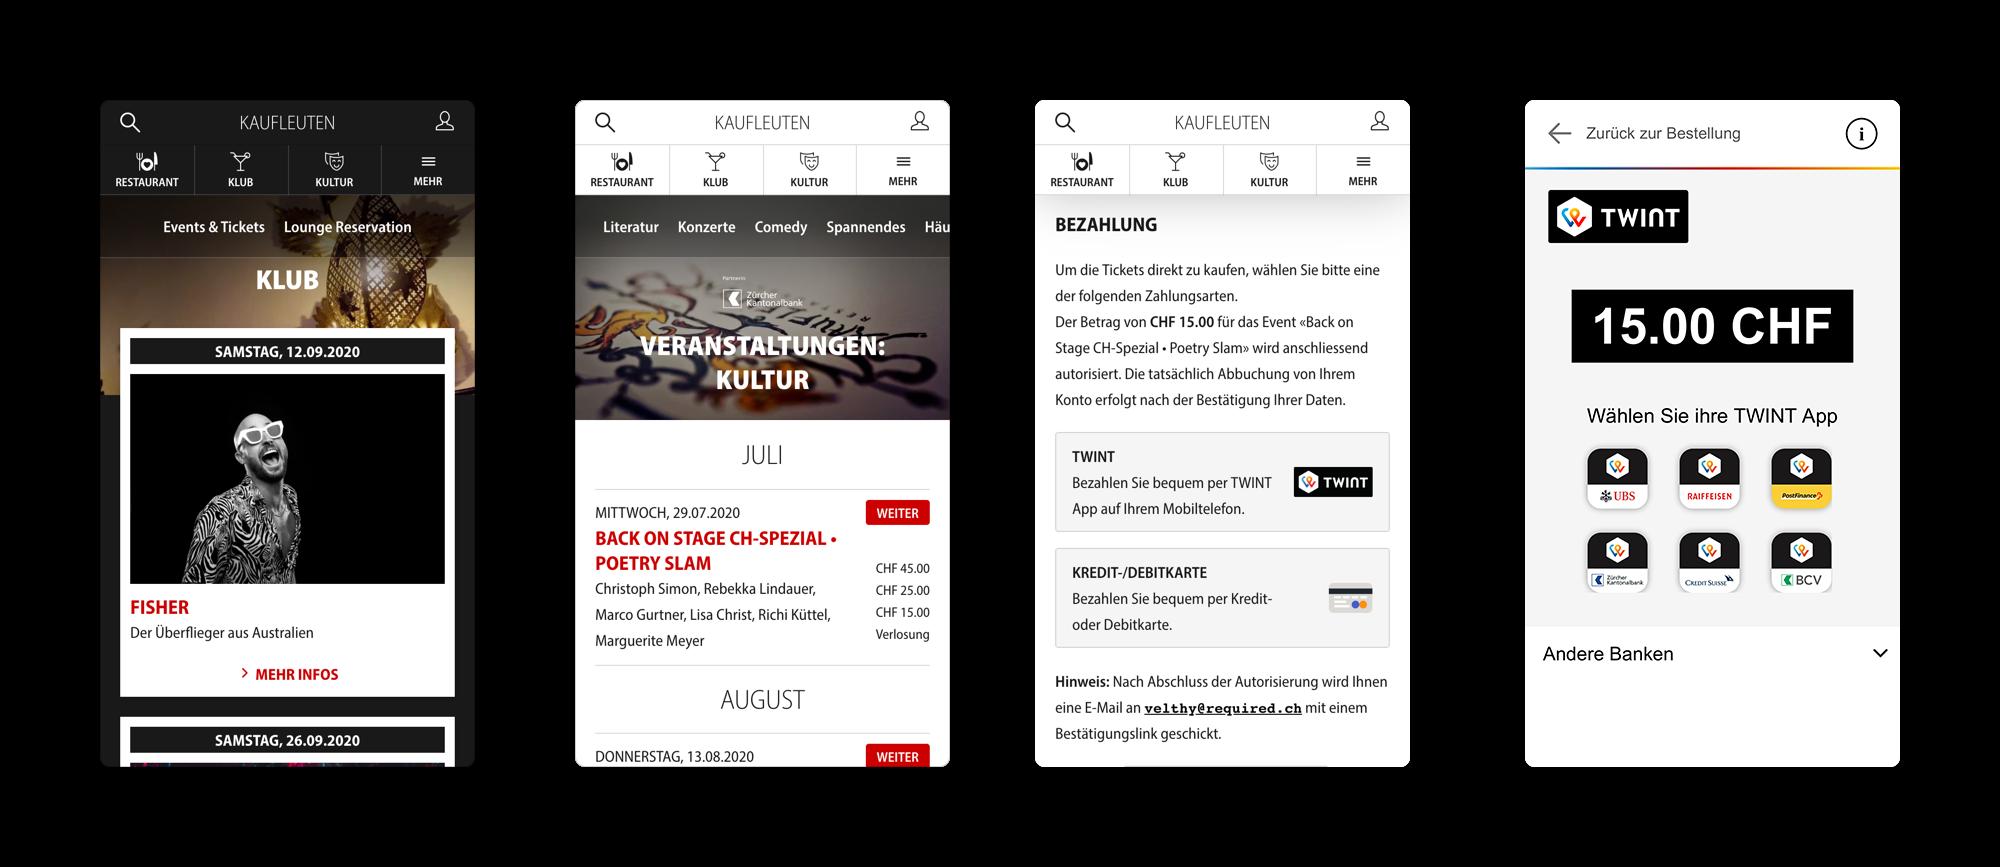 Screenshots Kaufleuten mobile Website